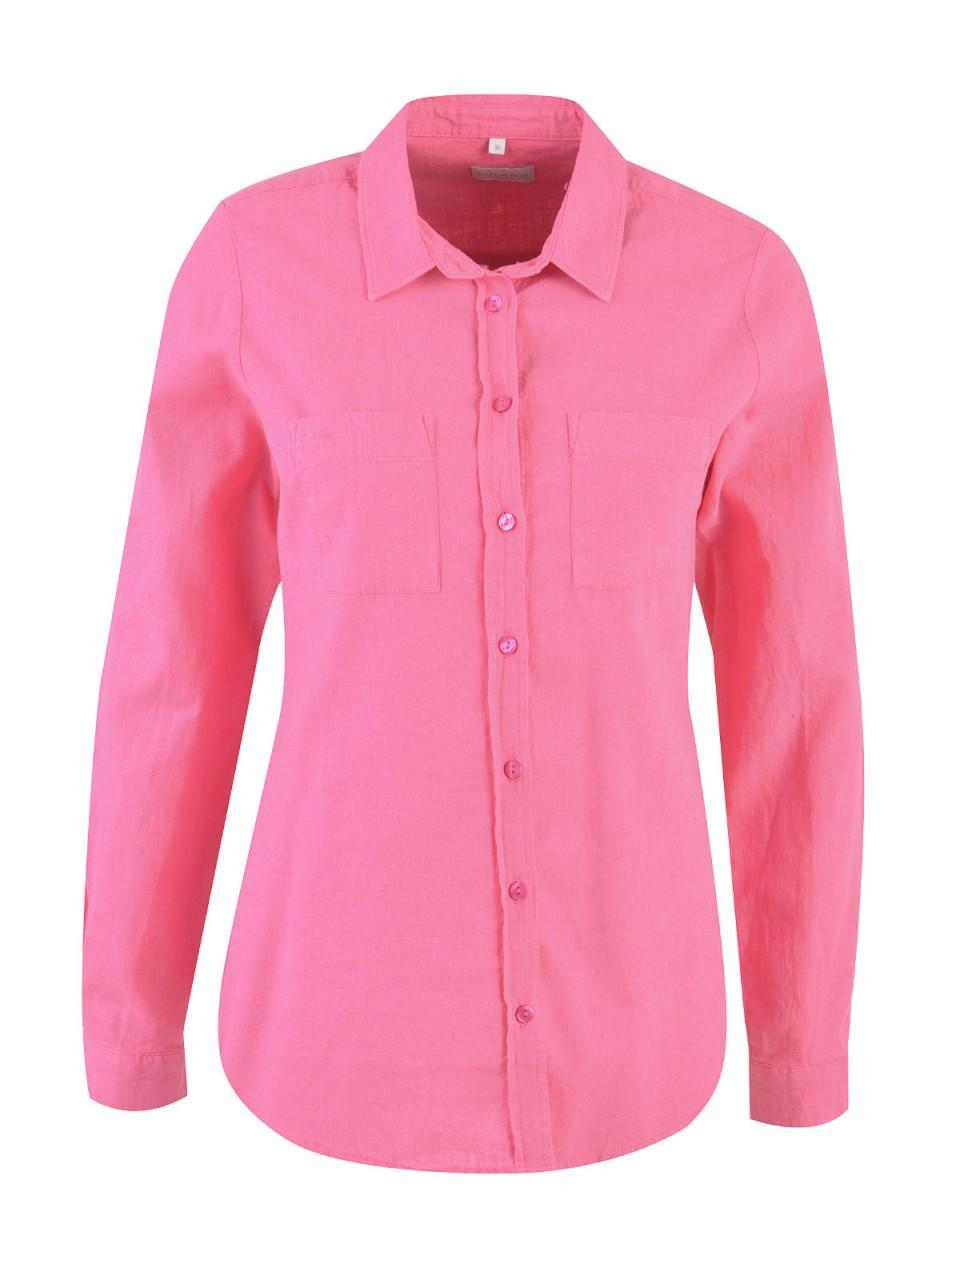 milano-italy-damen-bluse-pink, 59.95 EUR @ designermode-com-mode